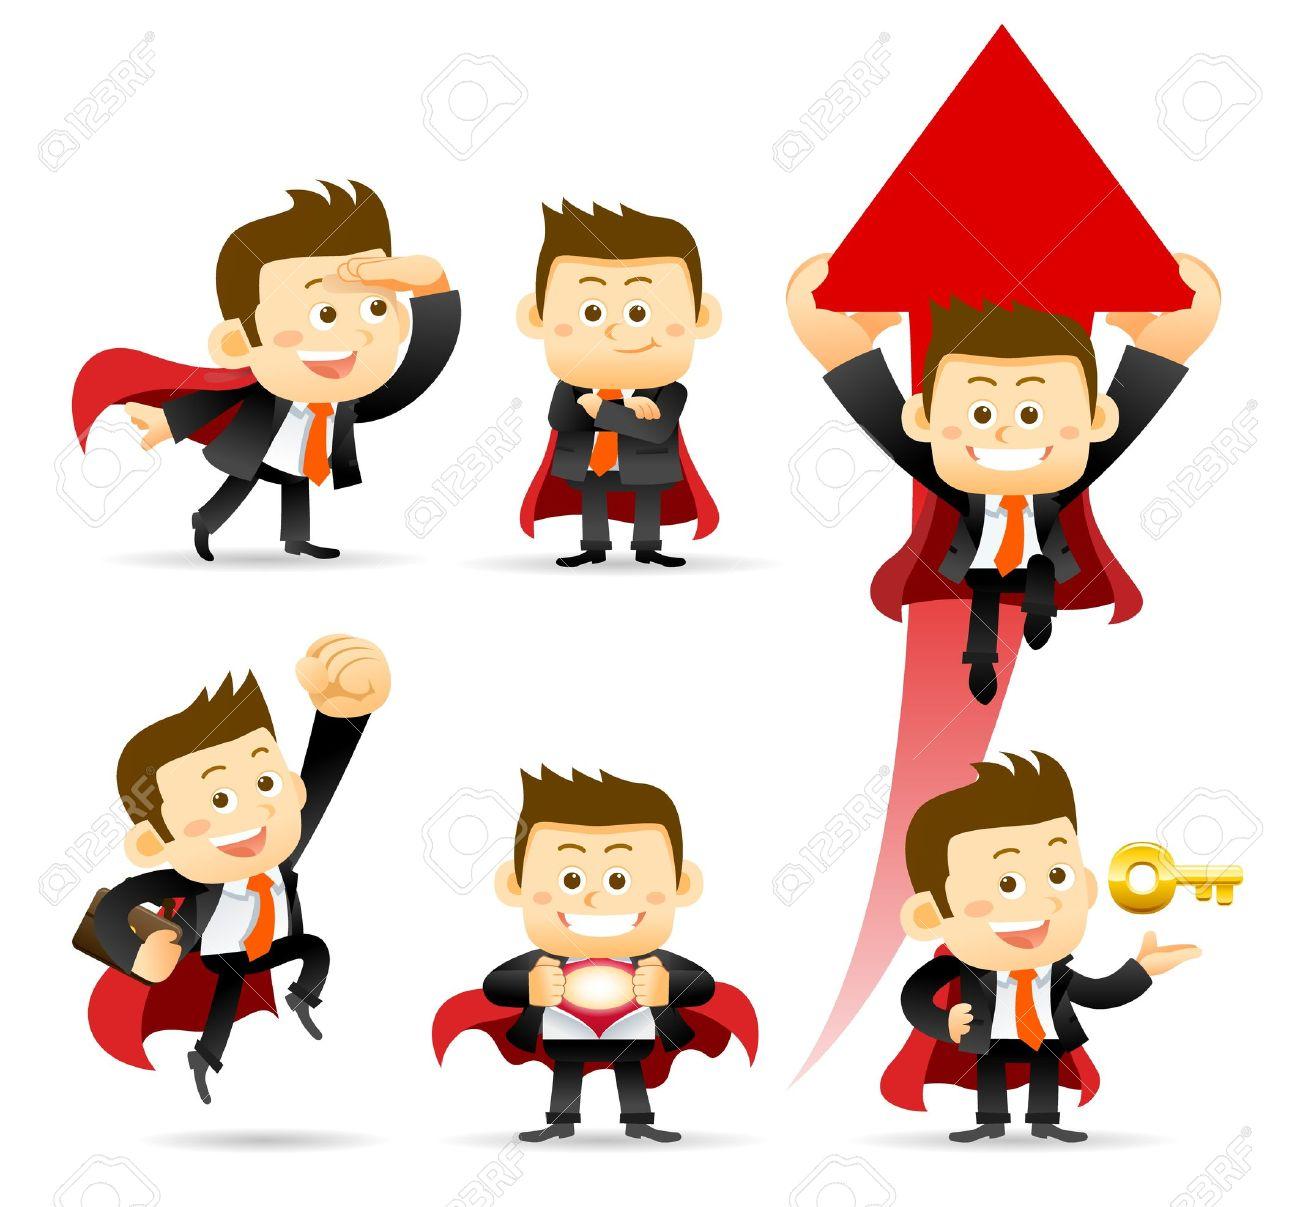 Super Businessman - 22019377